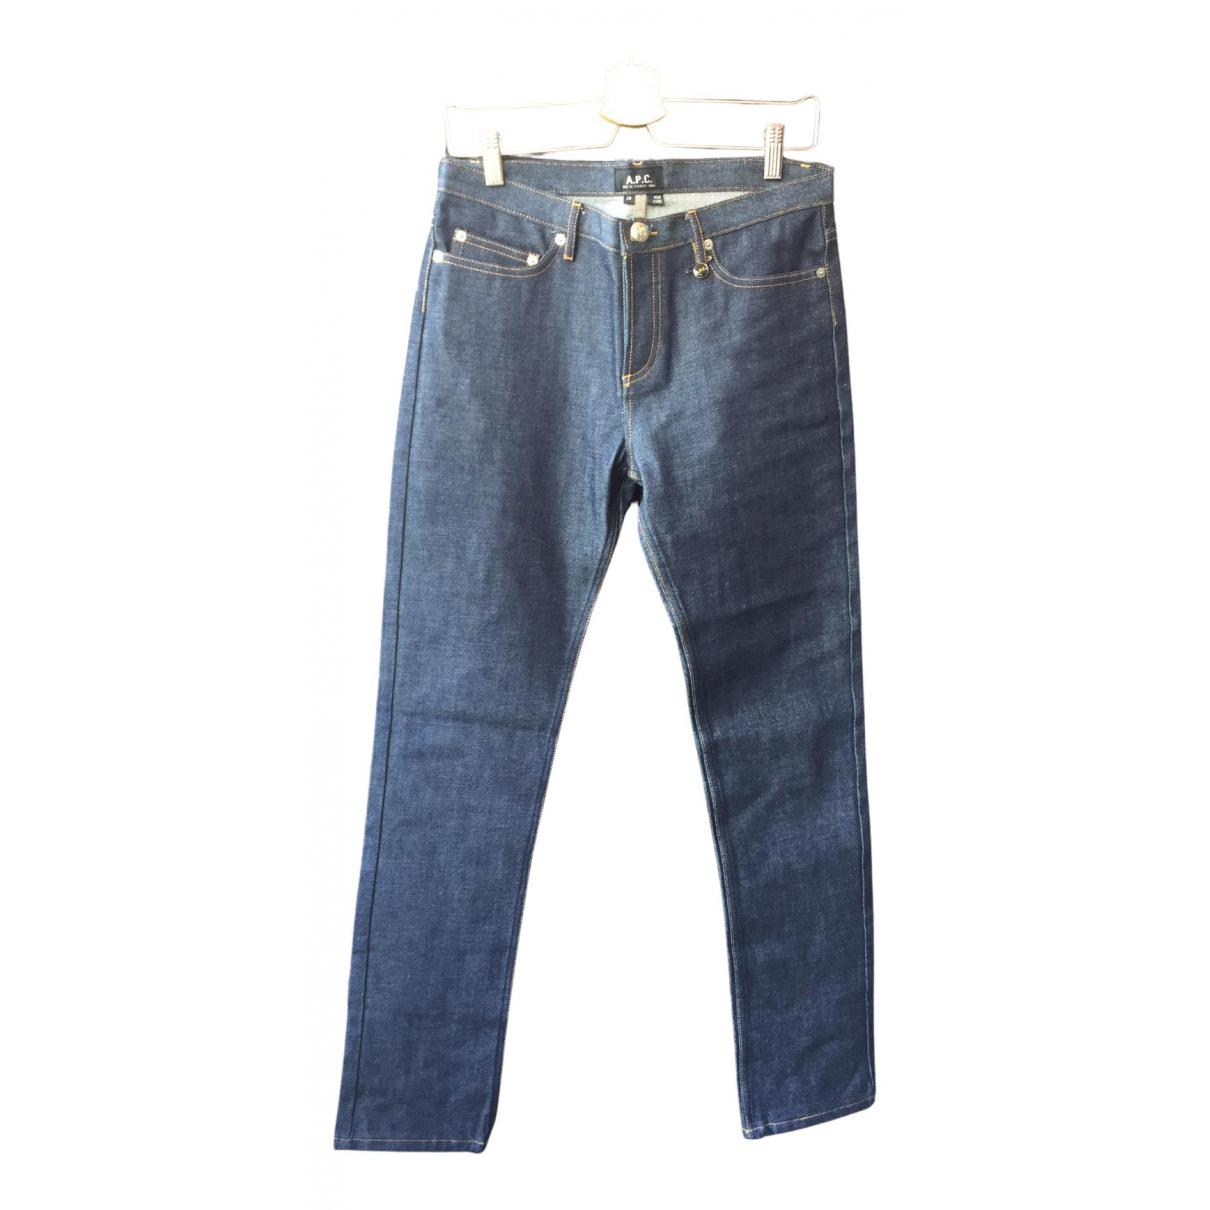 Apc N Blue Denim - Jeans Jeans for Women 29 US